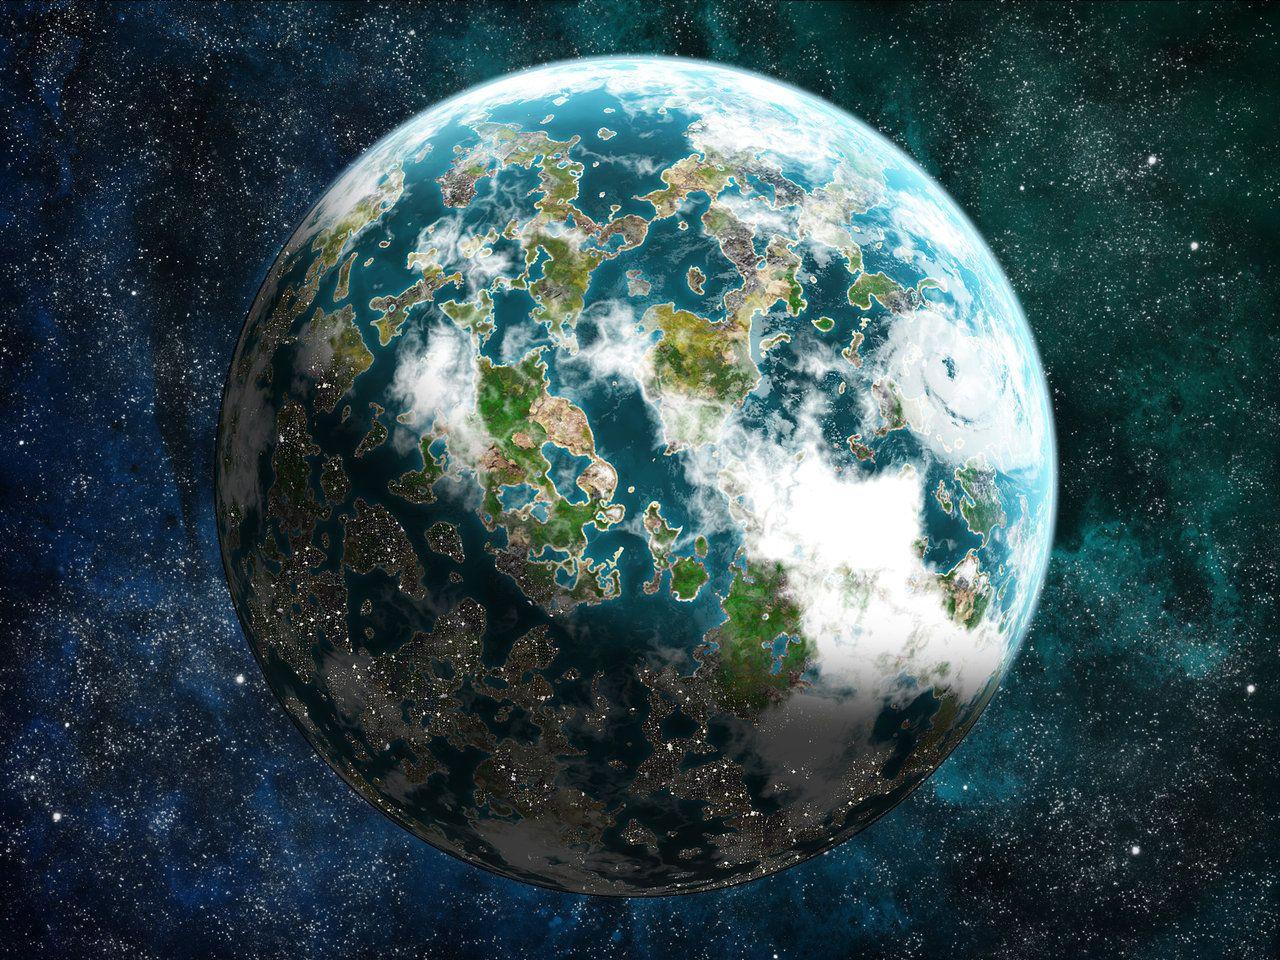 earth like planet found video - HD1280×960